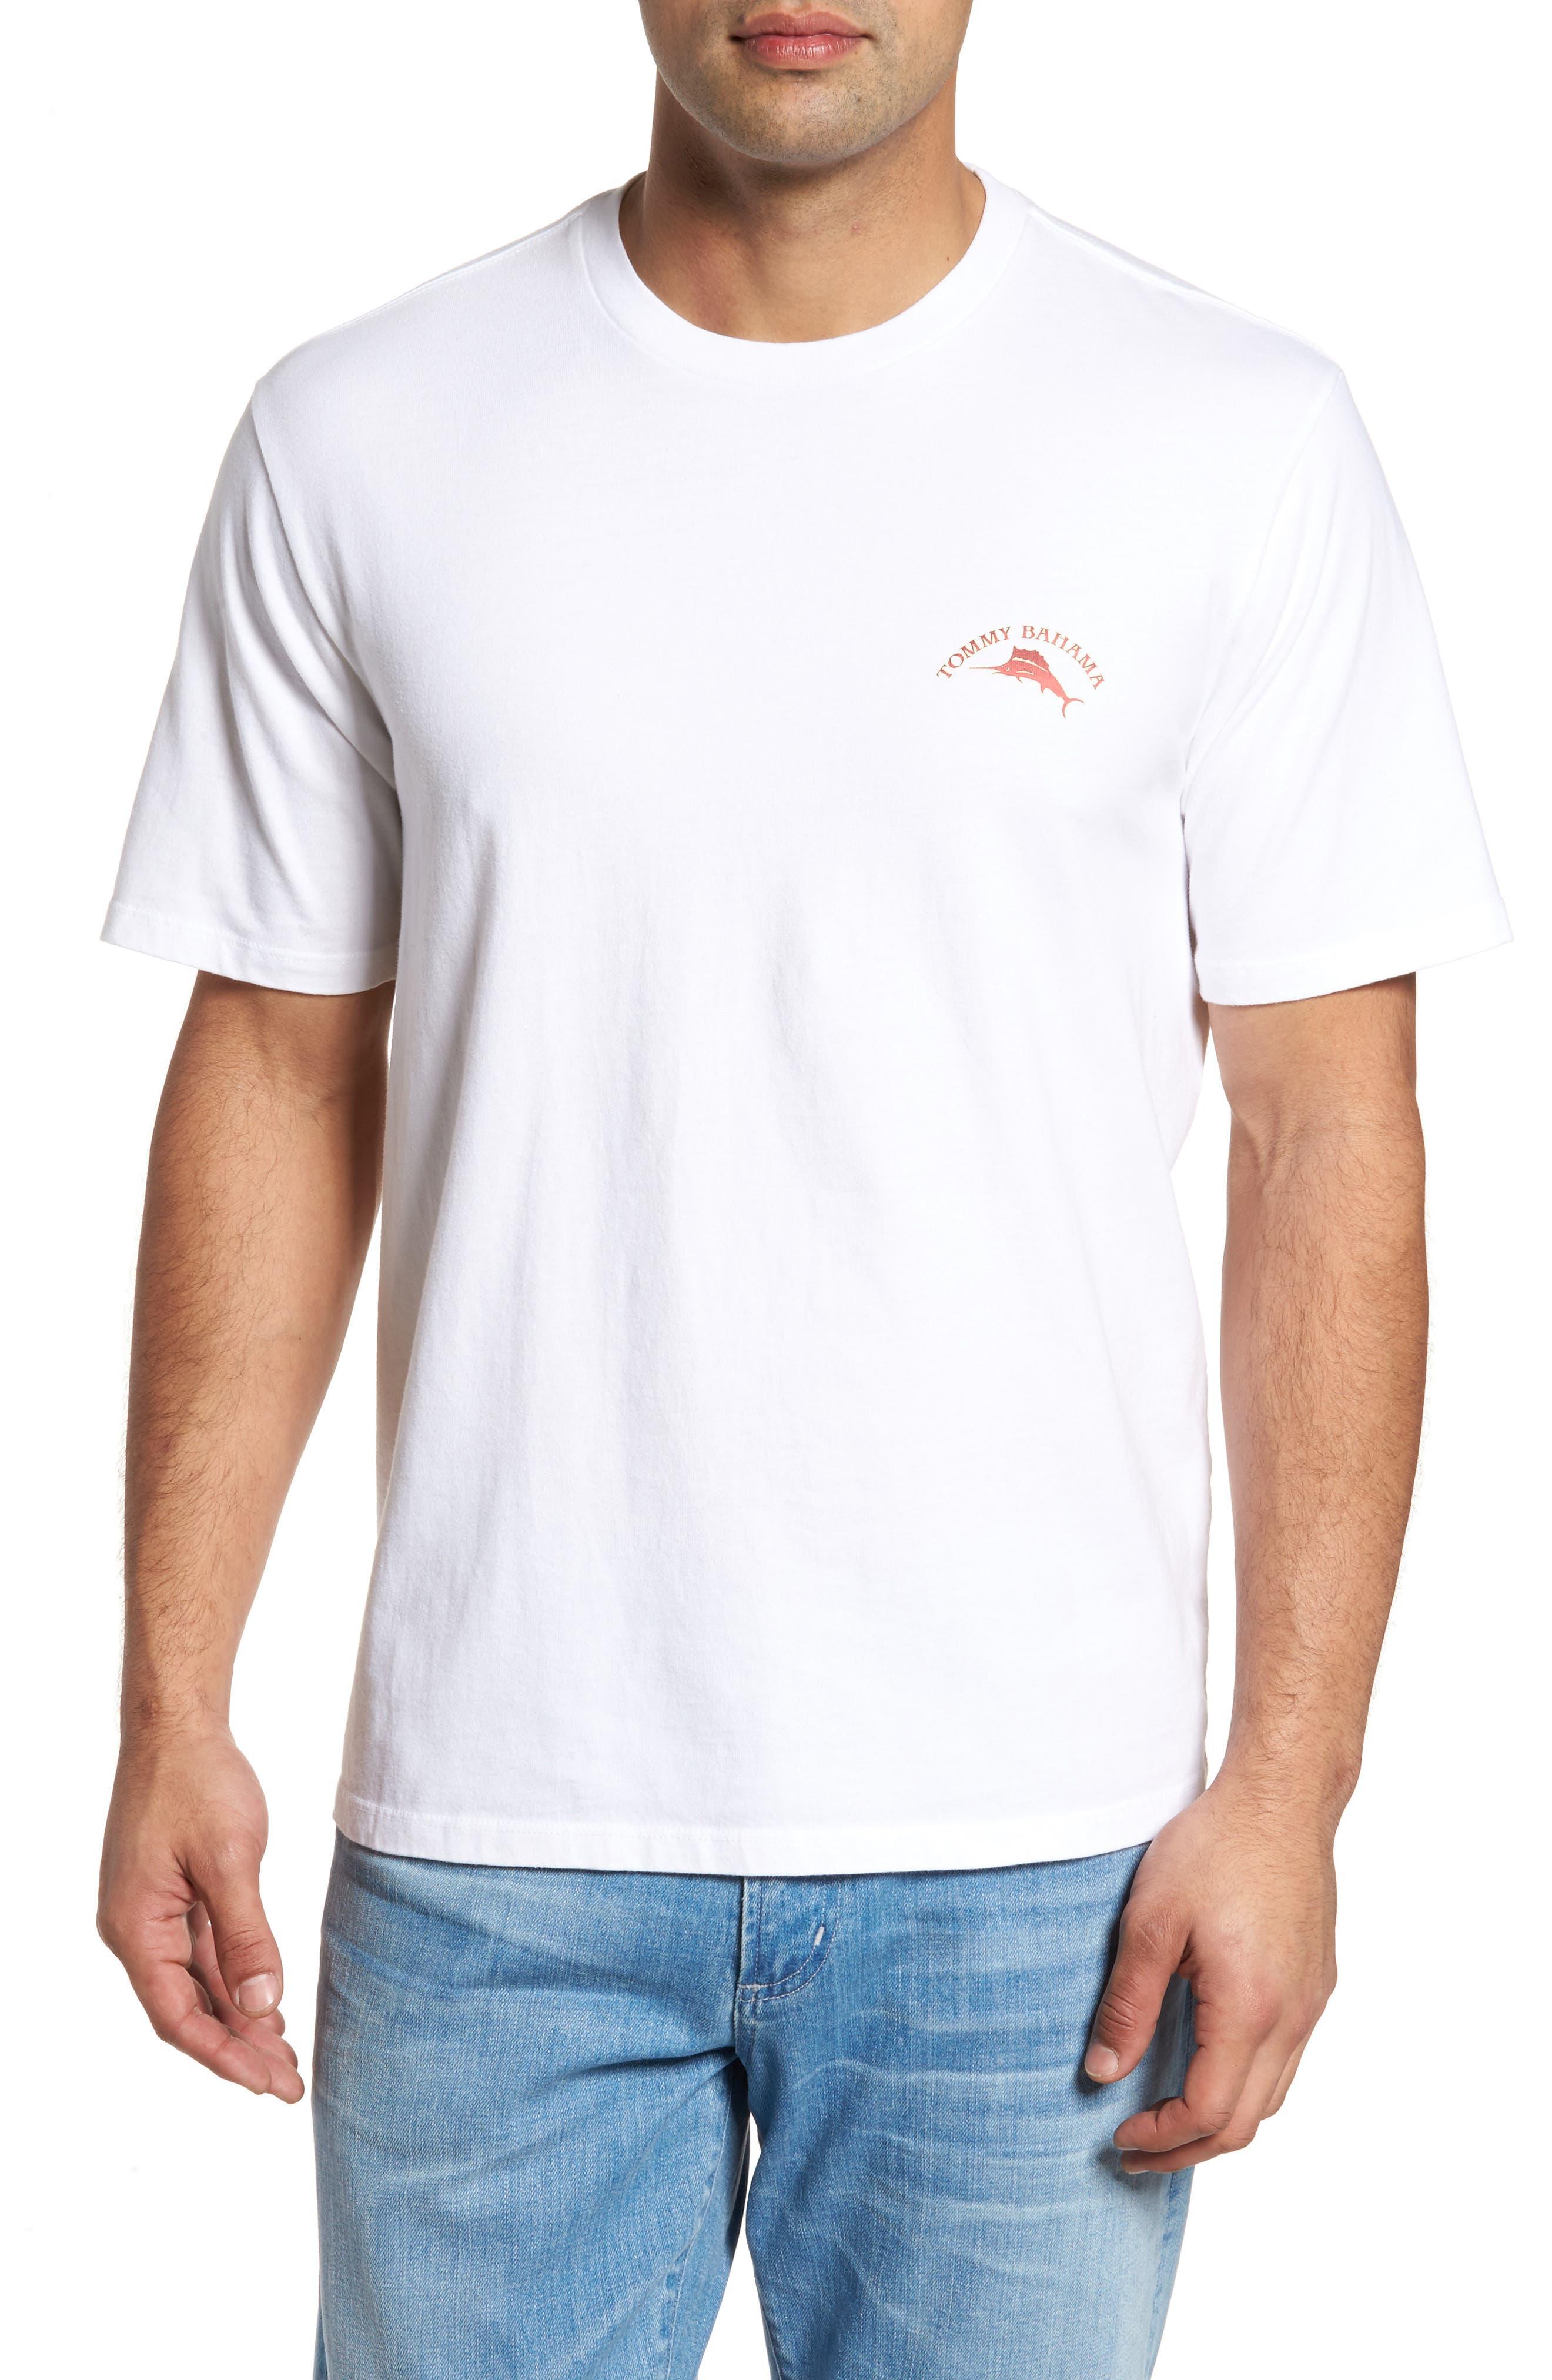 Zinspiration Graphic T-Shirt,                         Main,                         color, White